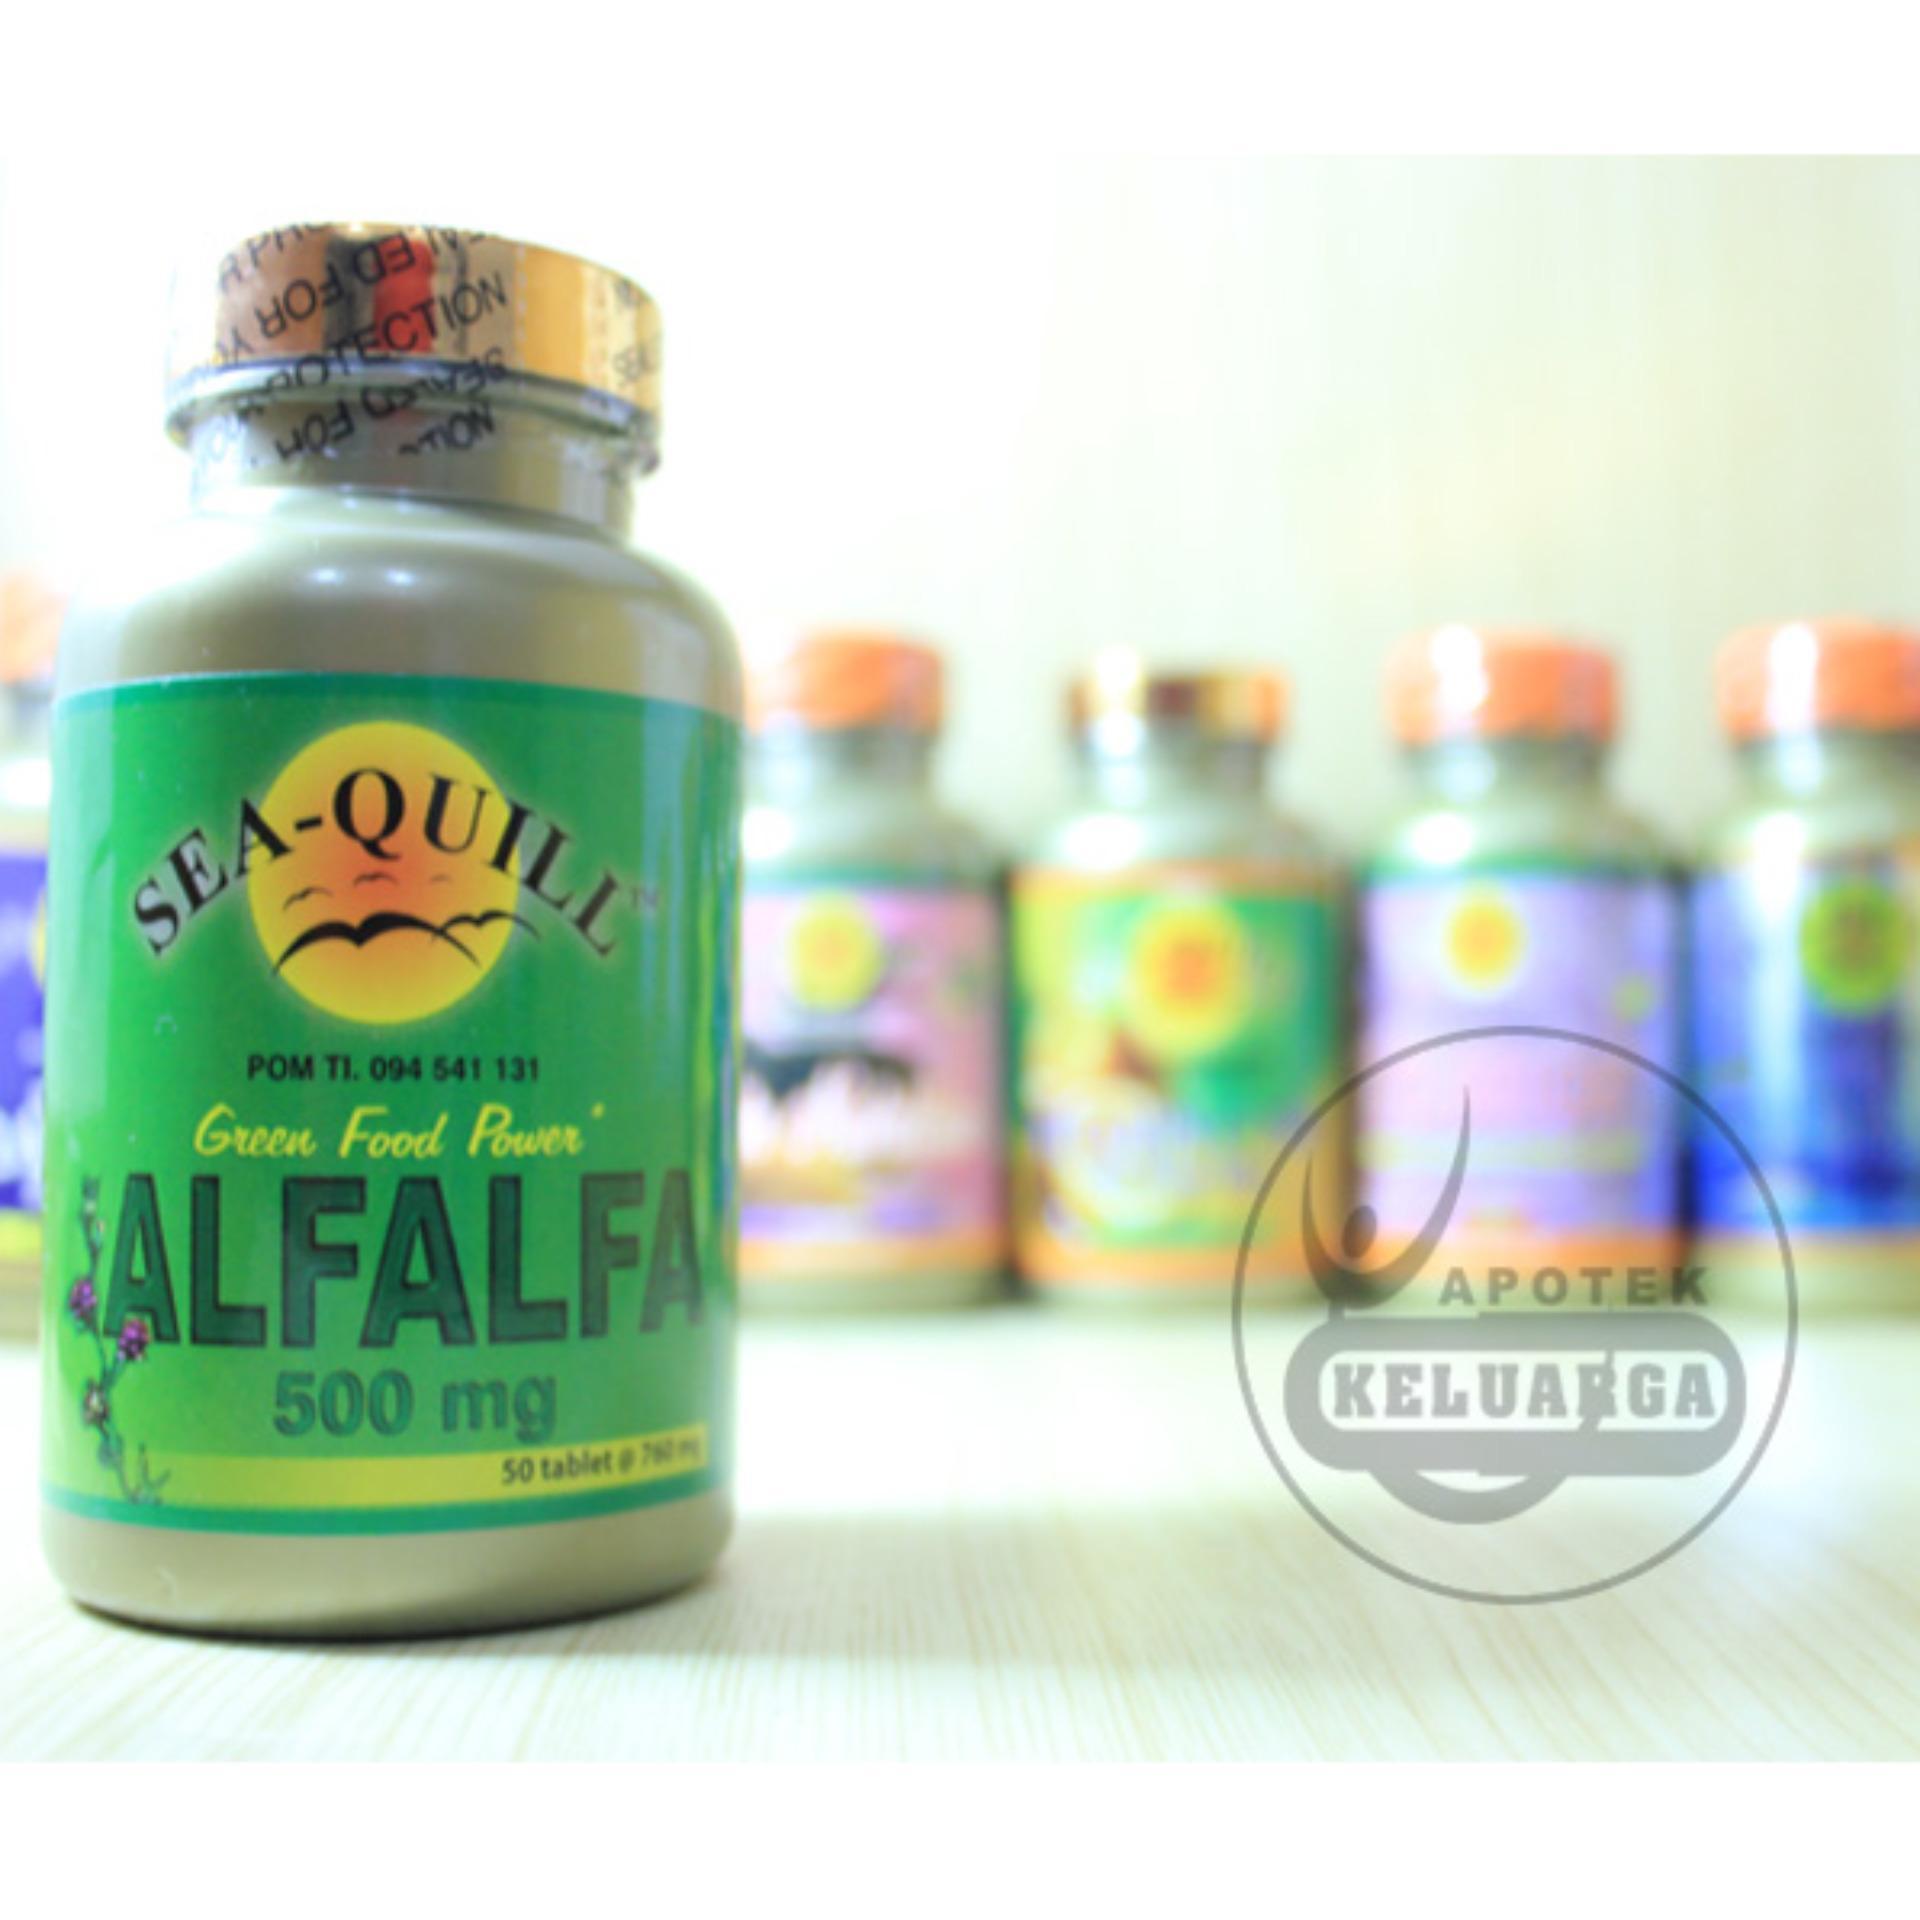 Sea Quill Alfalfa Daftar Harga Penjualan Terbaik Terkini Dan Sedafit Relafit